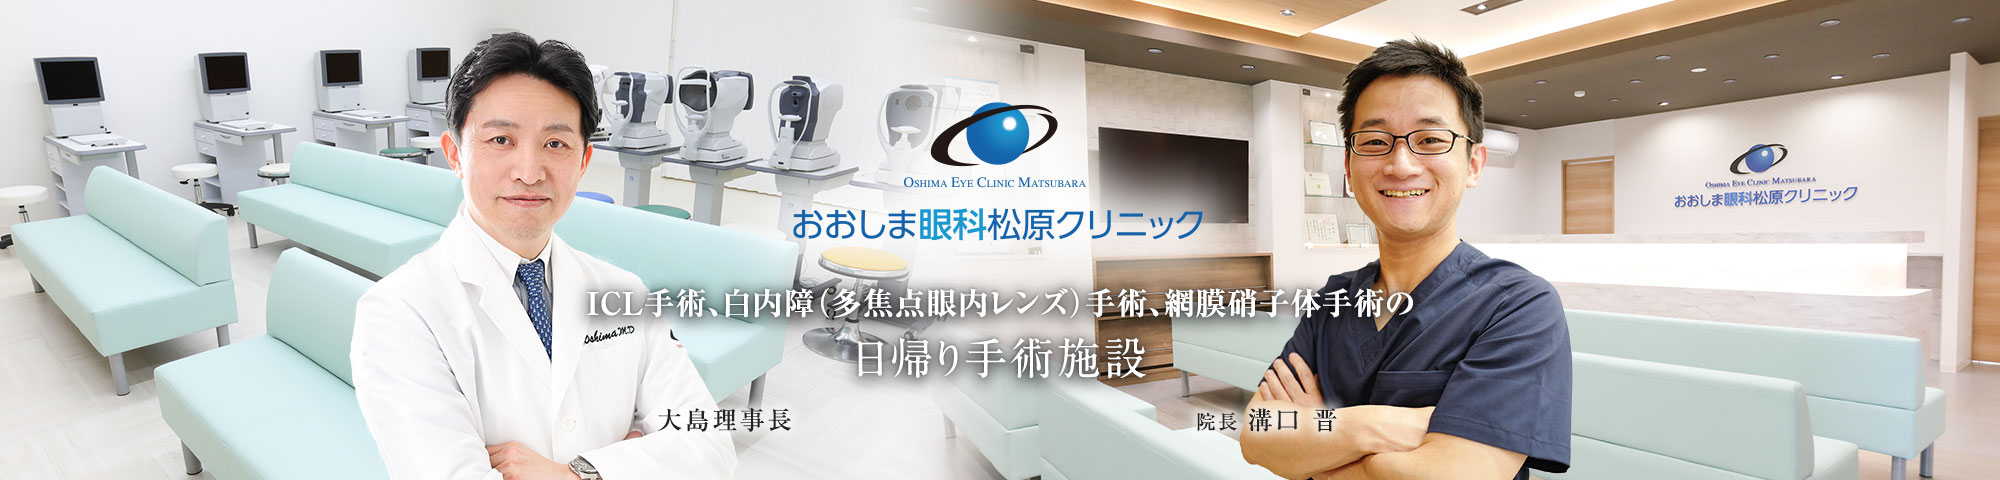 小児眼科、白内障(多焦点レンズ)手術、網膜硝子体手術の日帰り手術施設